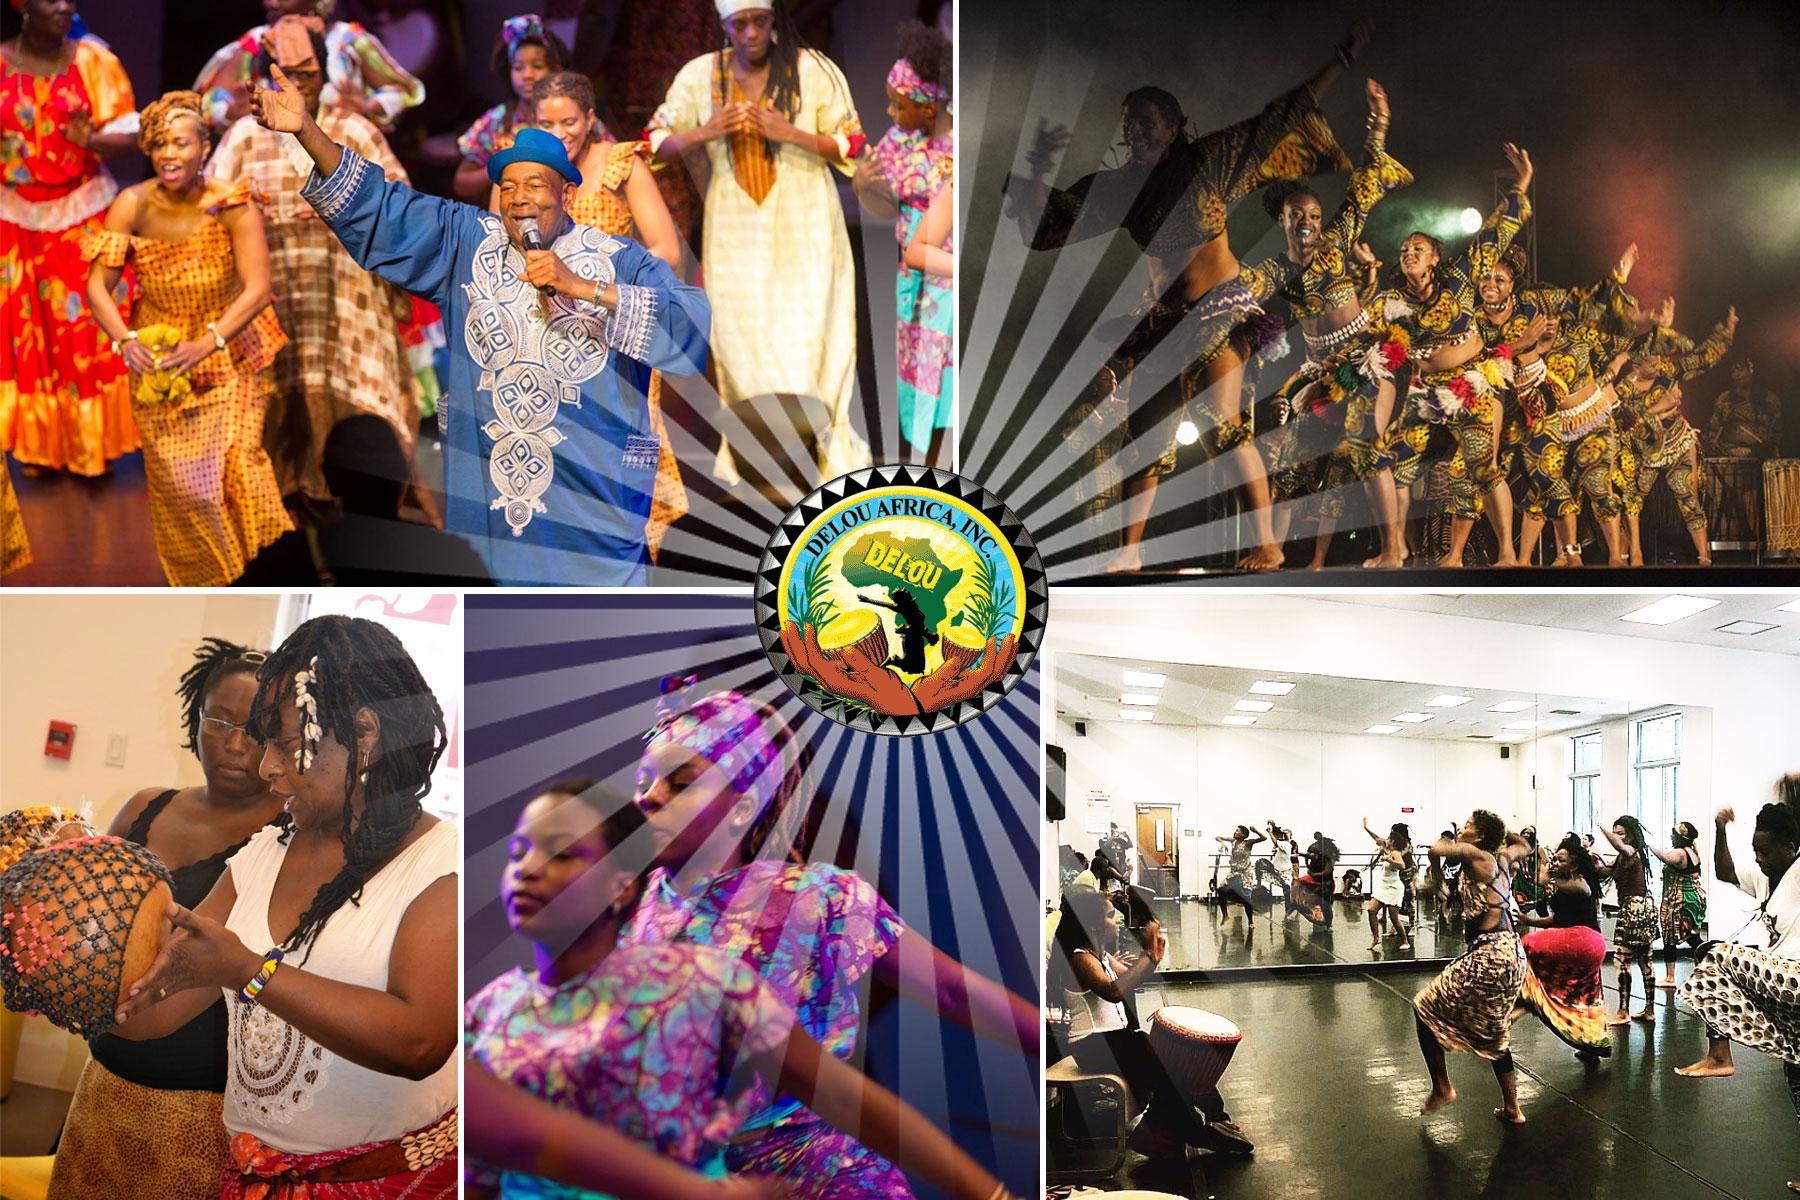 Delou Africa